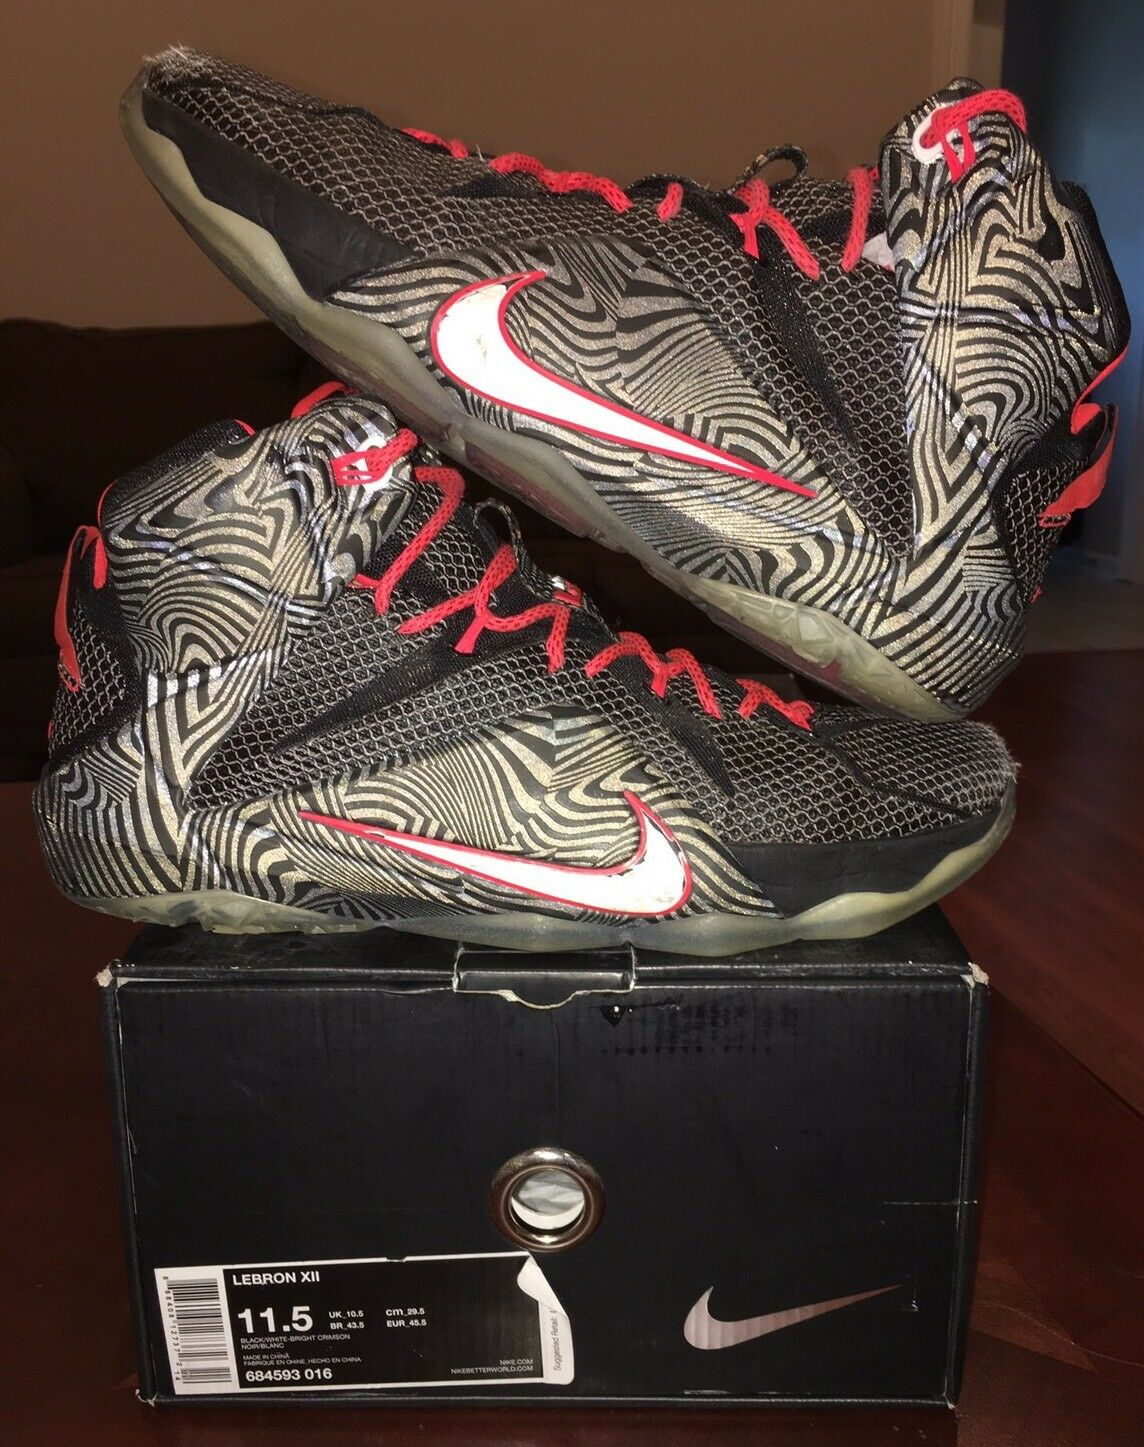 Nike Lebron 12 Soldier Red Black 23 Air Zoom Heat 8 9 10 11 13 Lot Jordan 14 4 1